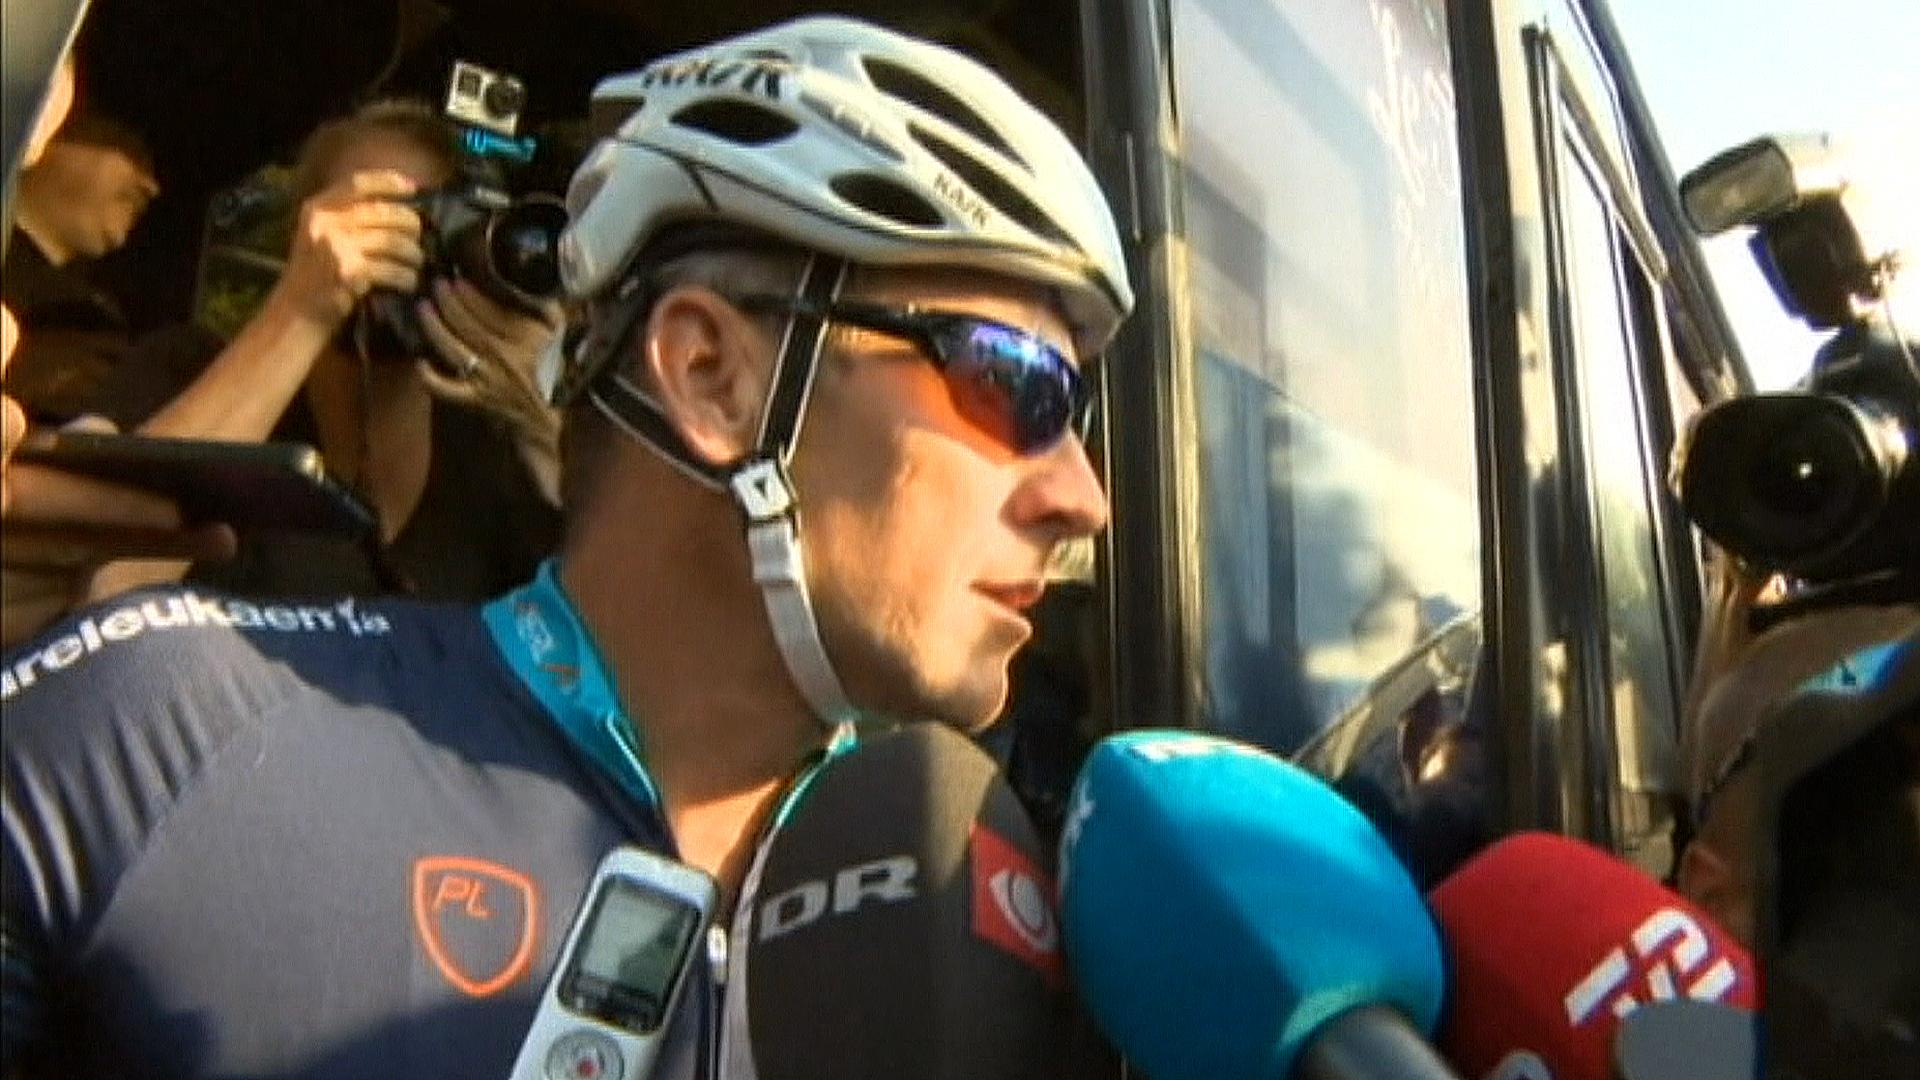 Lance Armstrong Media Frenzy - NBC News